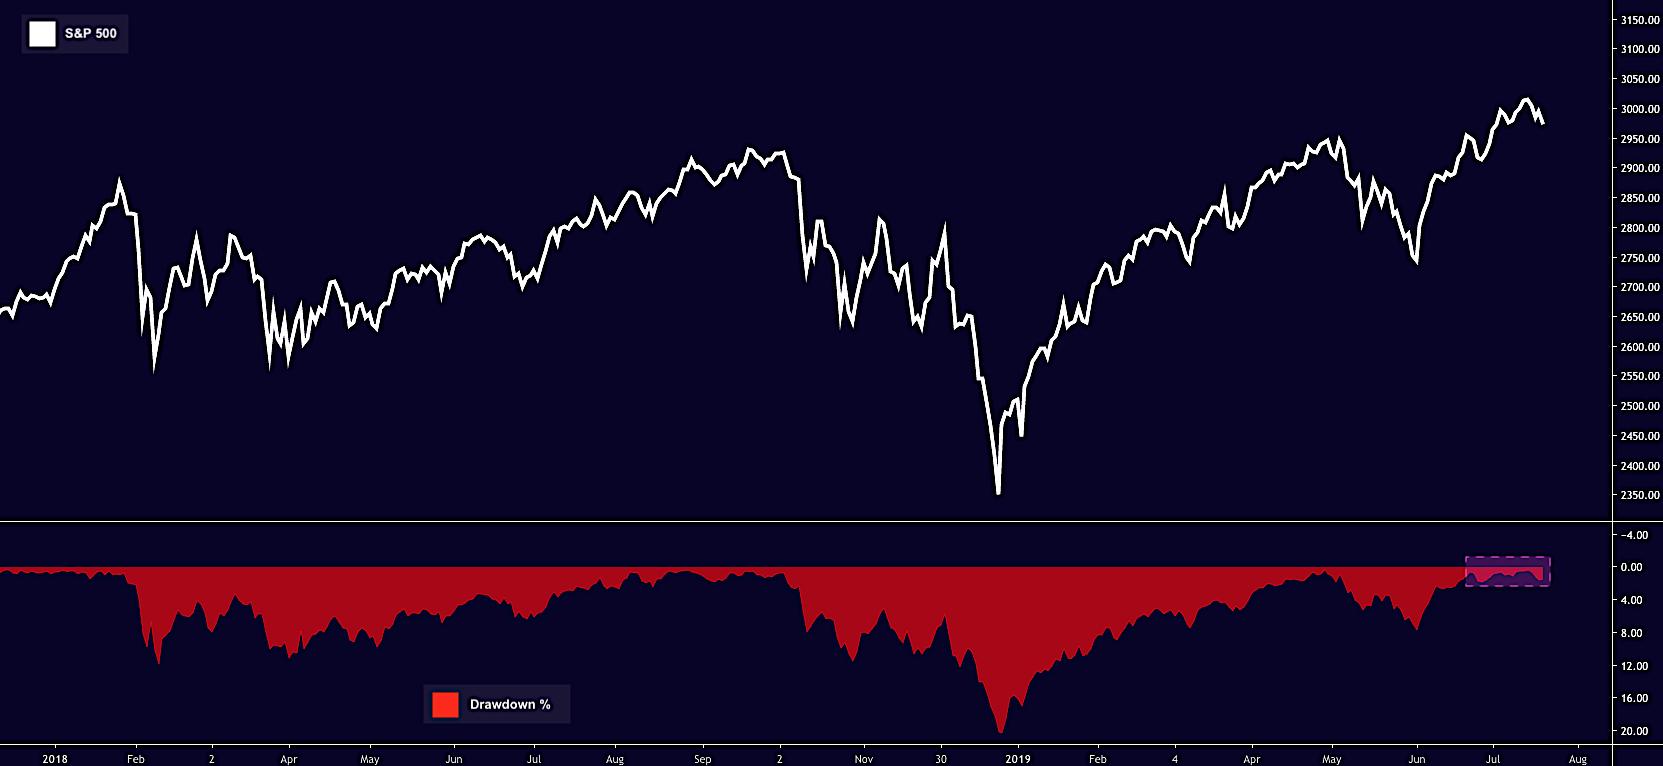 S&P 500 : Investing Ideas, Market Estimates, Share Price